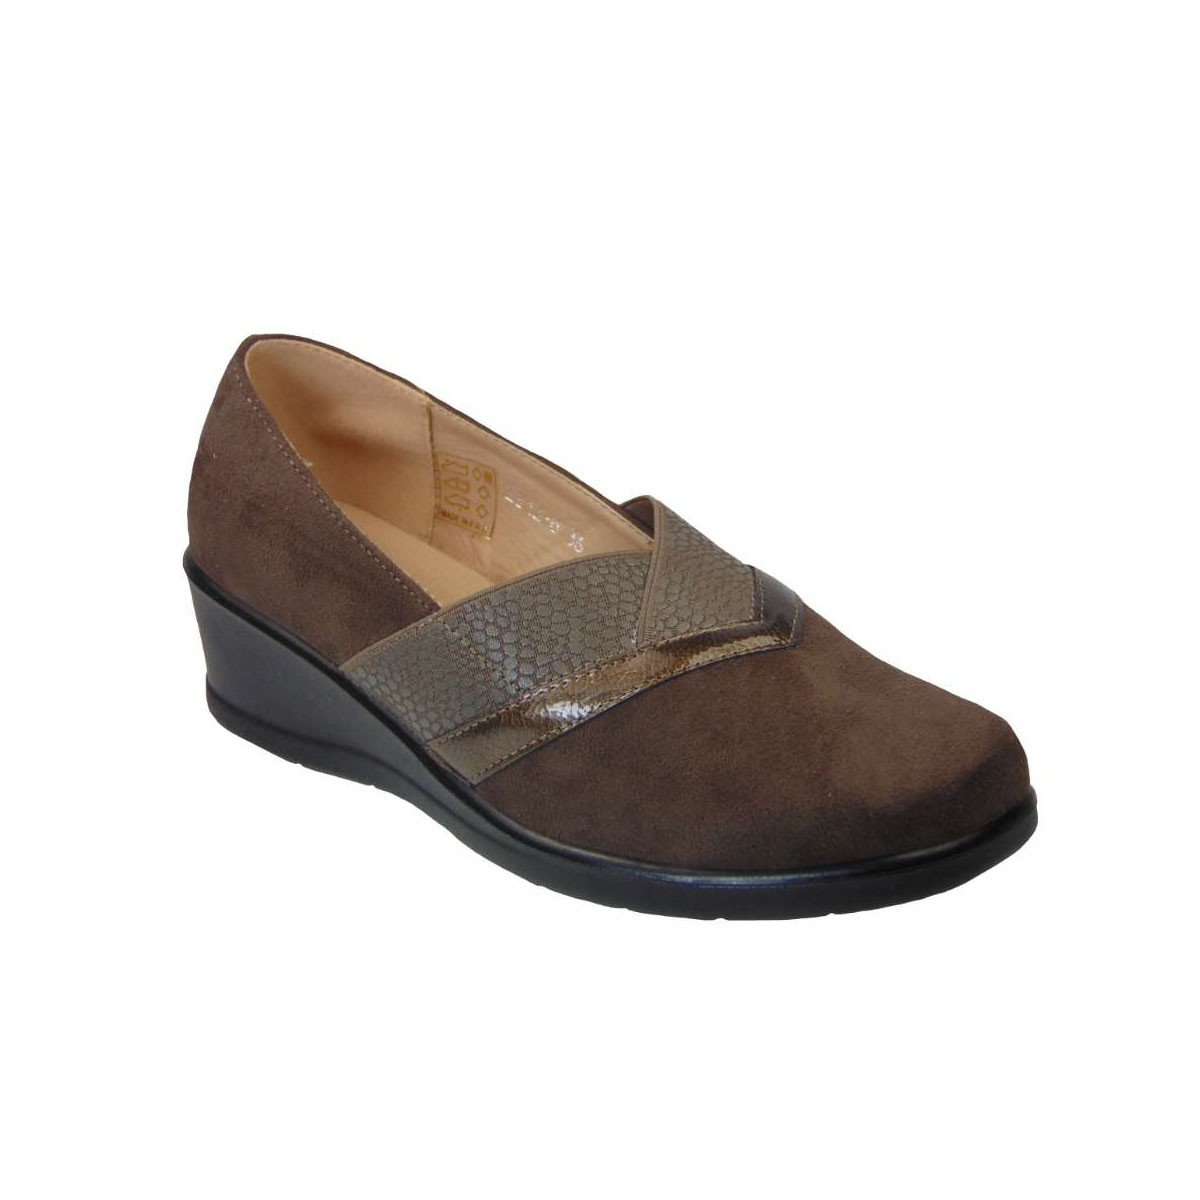 Tsimpolis Shoes ZS12-6 Γυναικείο Slip On Από Τεχνοκαστόρ Καφέ